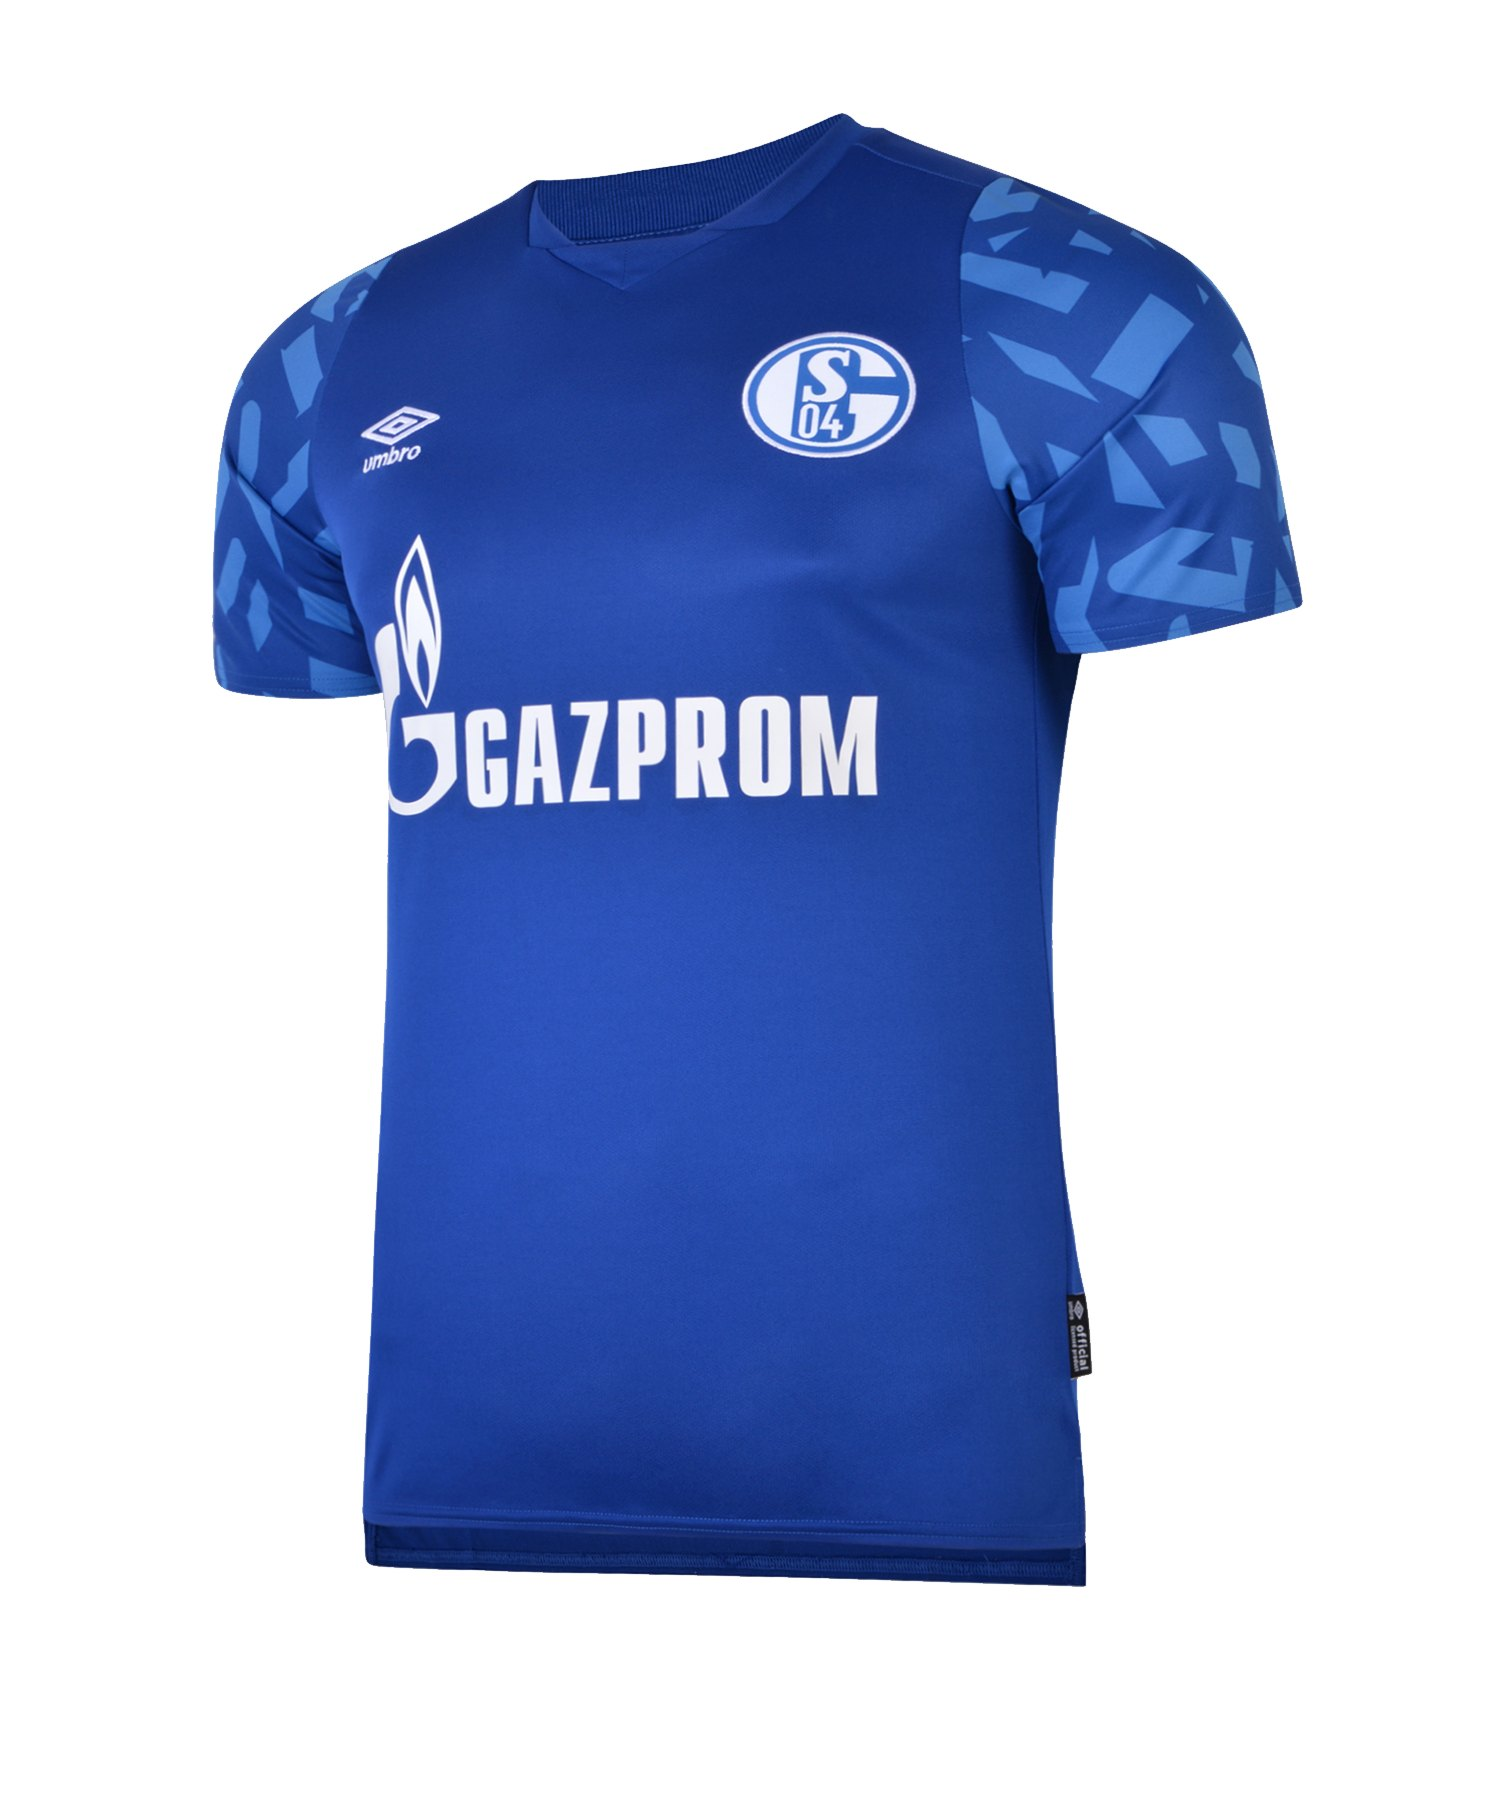 Umbro FC Schalke 04 Trikot Home 2019/2020 Blau - blau